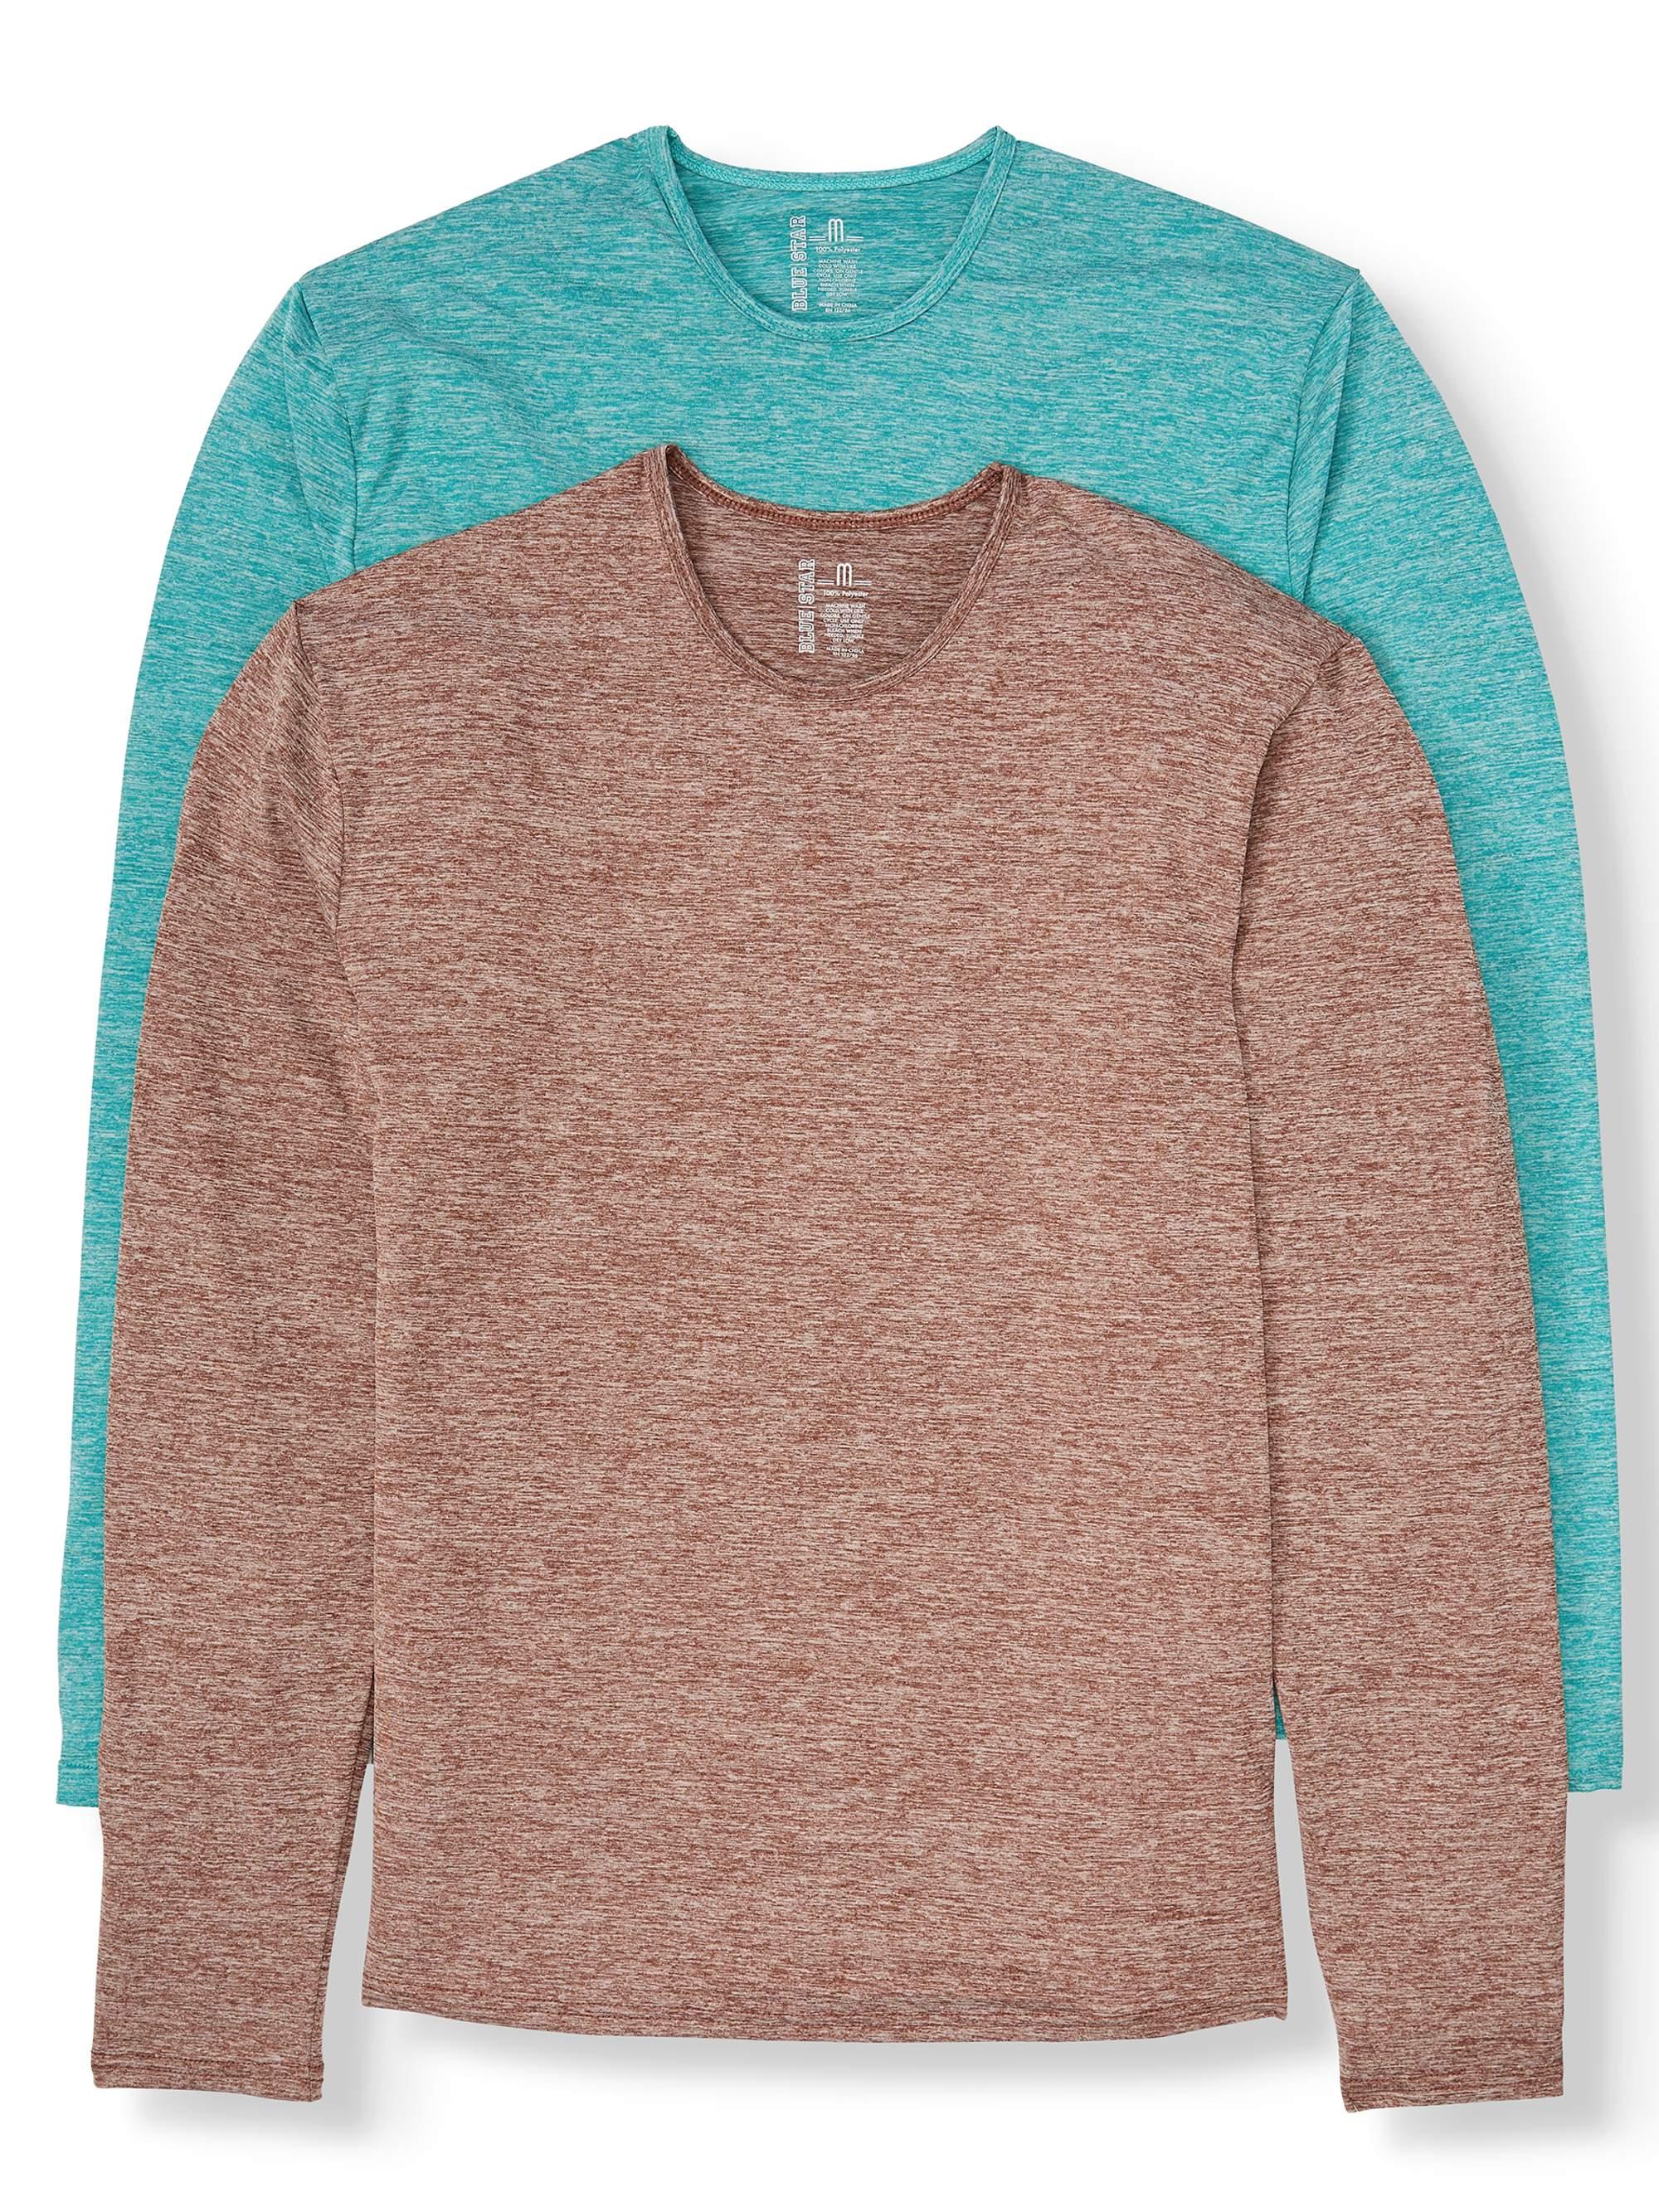 $8 (reg $16) Blue Star Clothin...